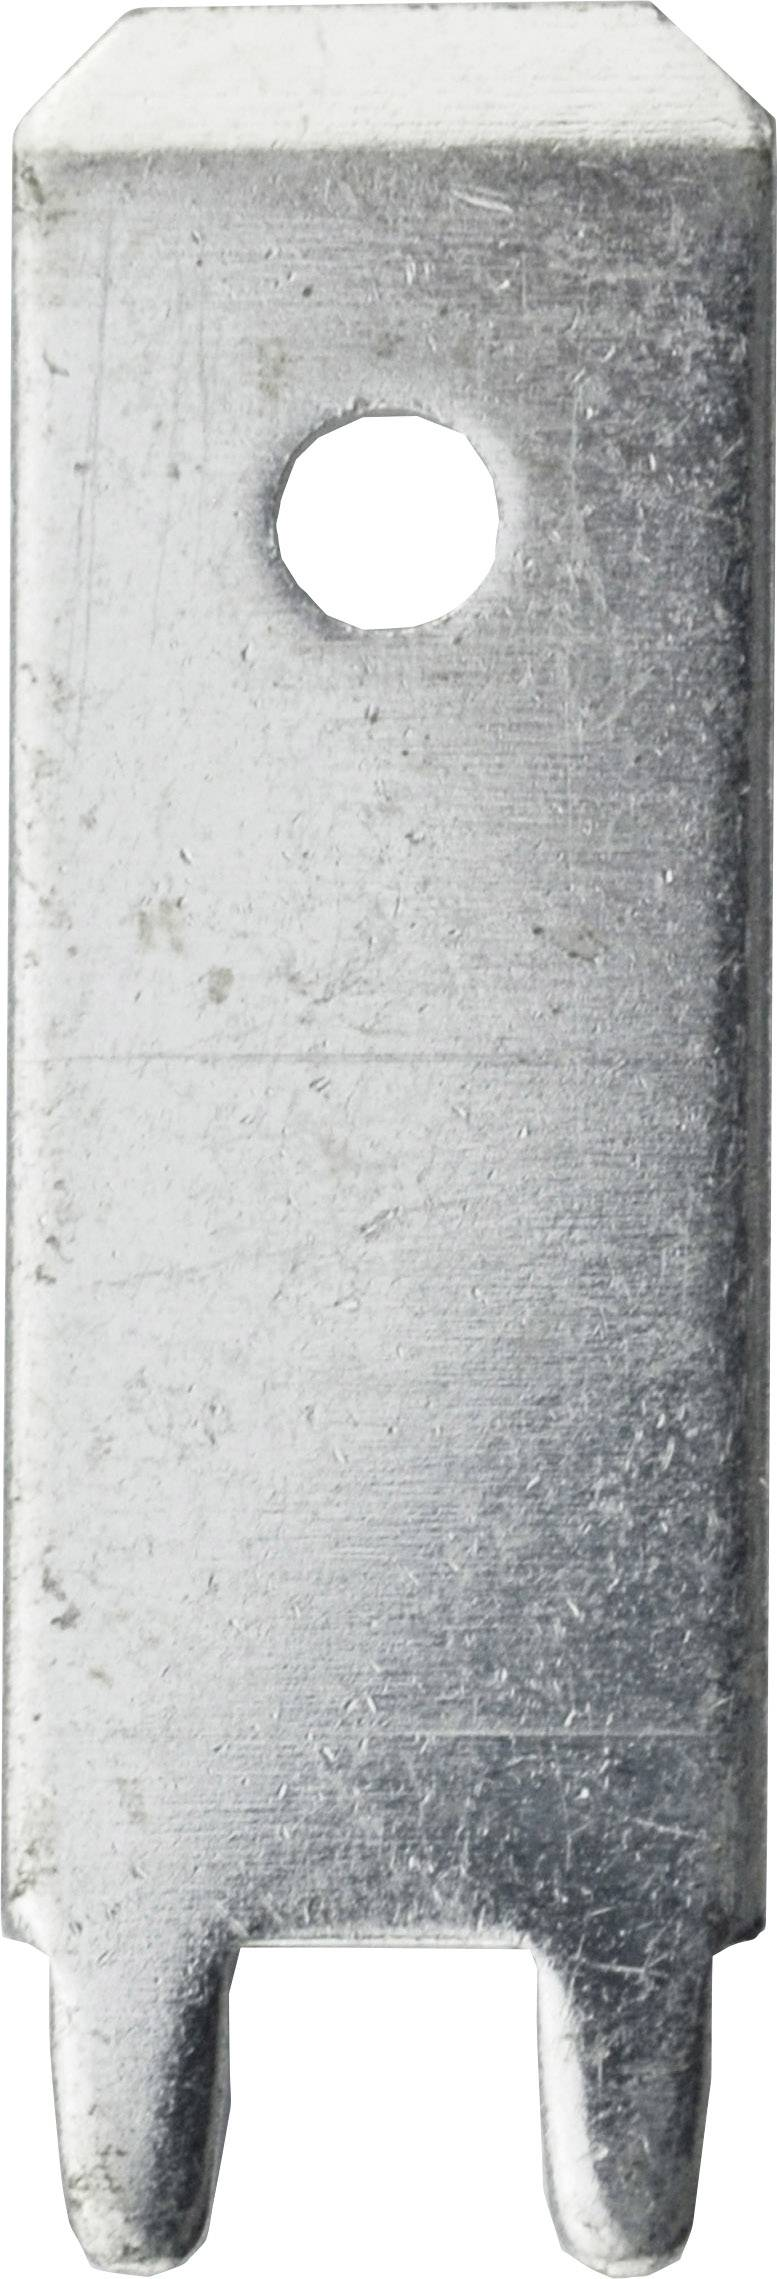 Faston zástrčka Vogt Verbindungstechnik 3866f.68 6.3 mm x 180 °, bez izolace, kov, 100 ks